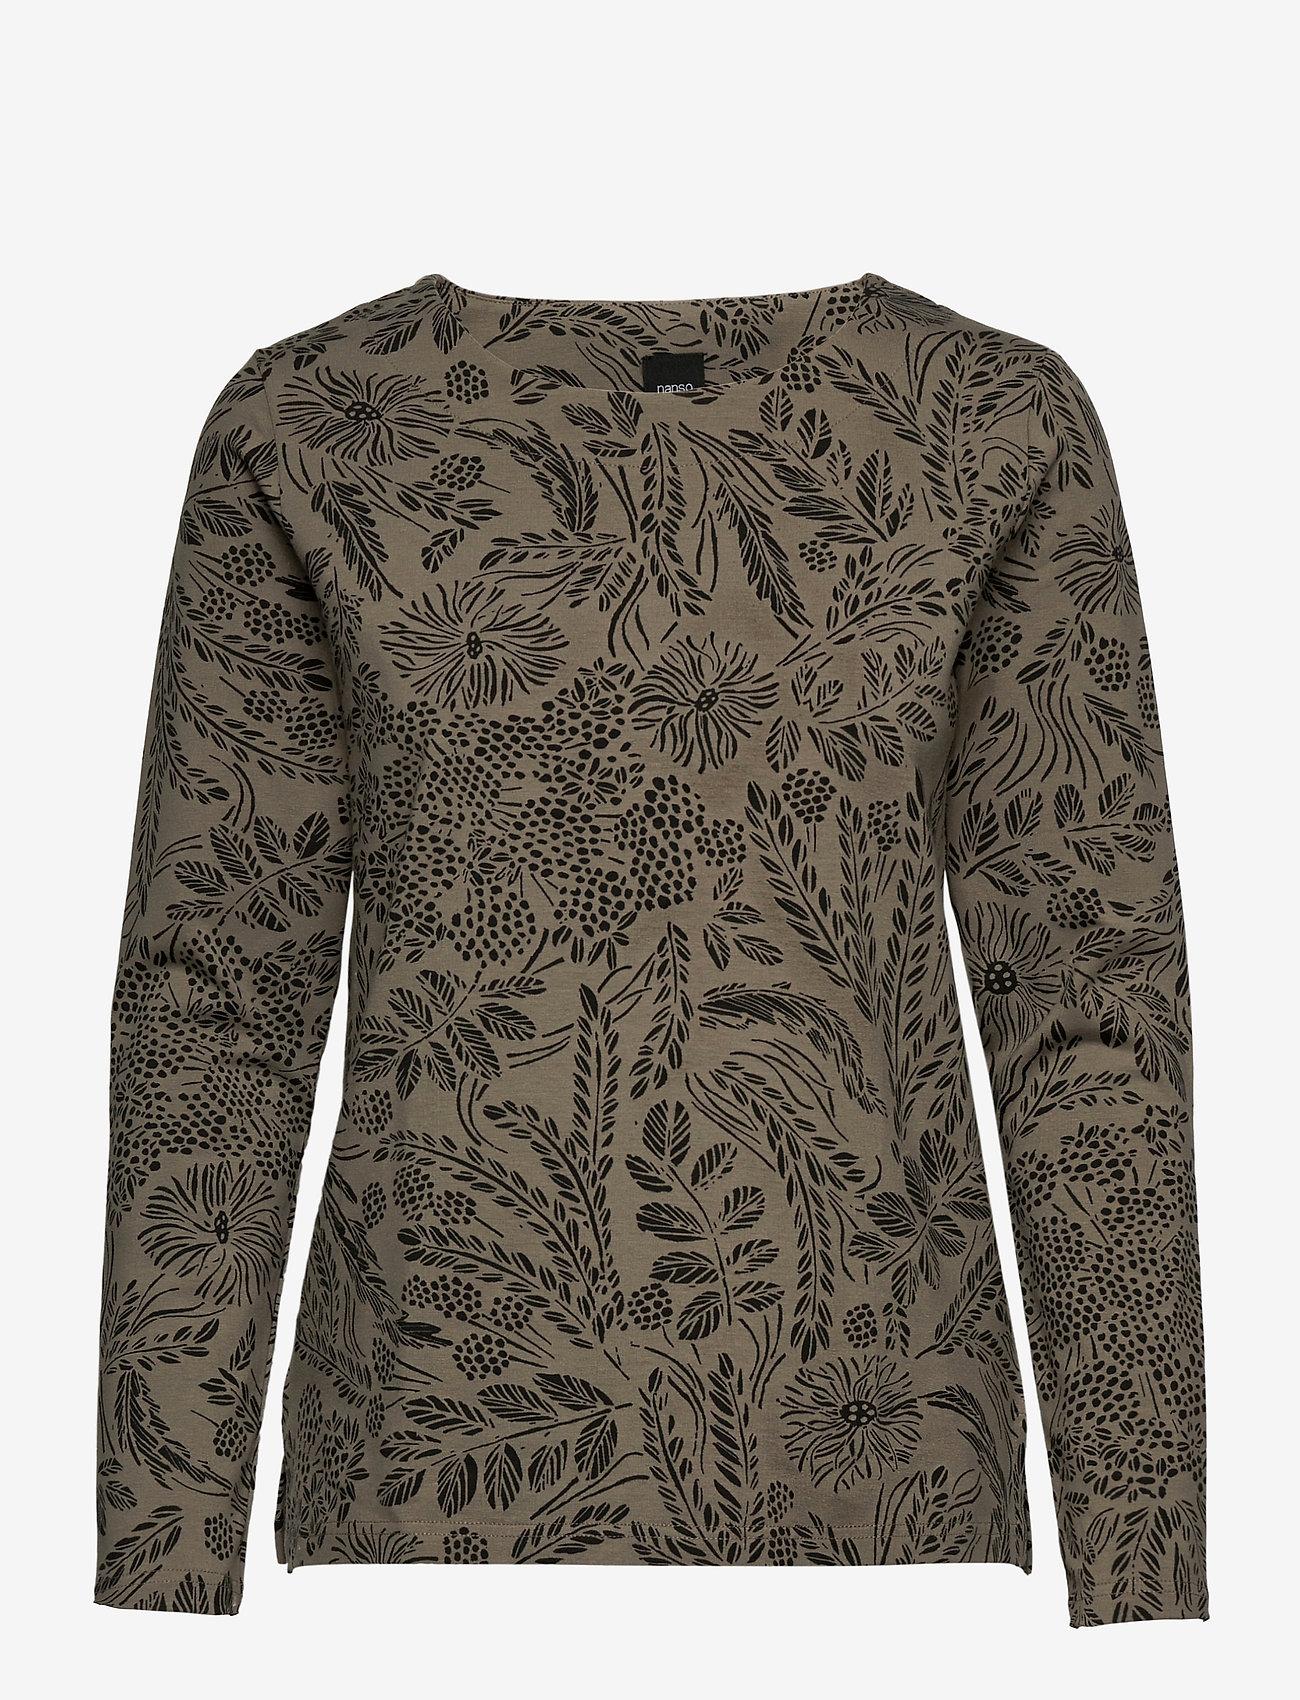 Nanso - Ladies blouse, Floora - pitkähihaiset t-paidat - olive green - 0